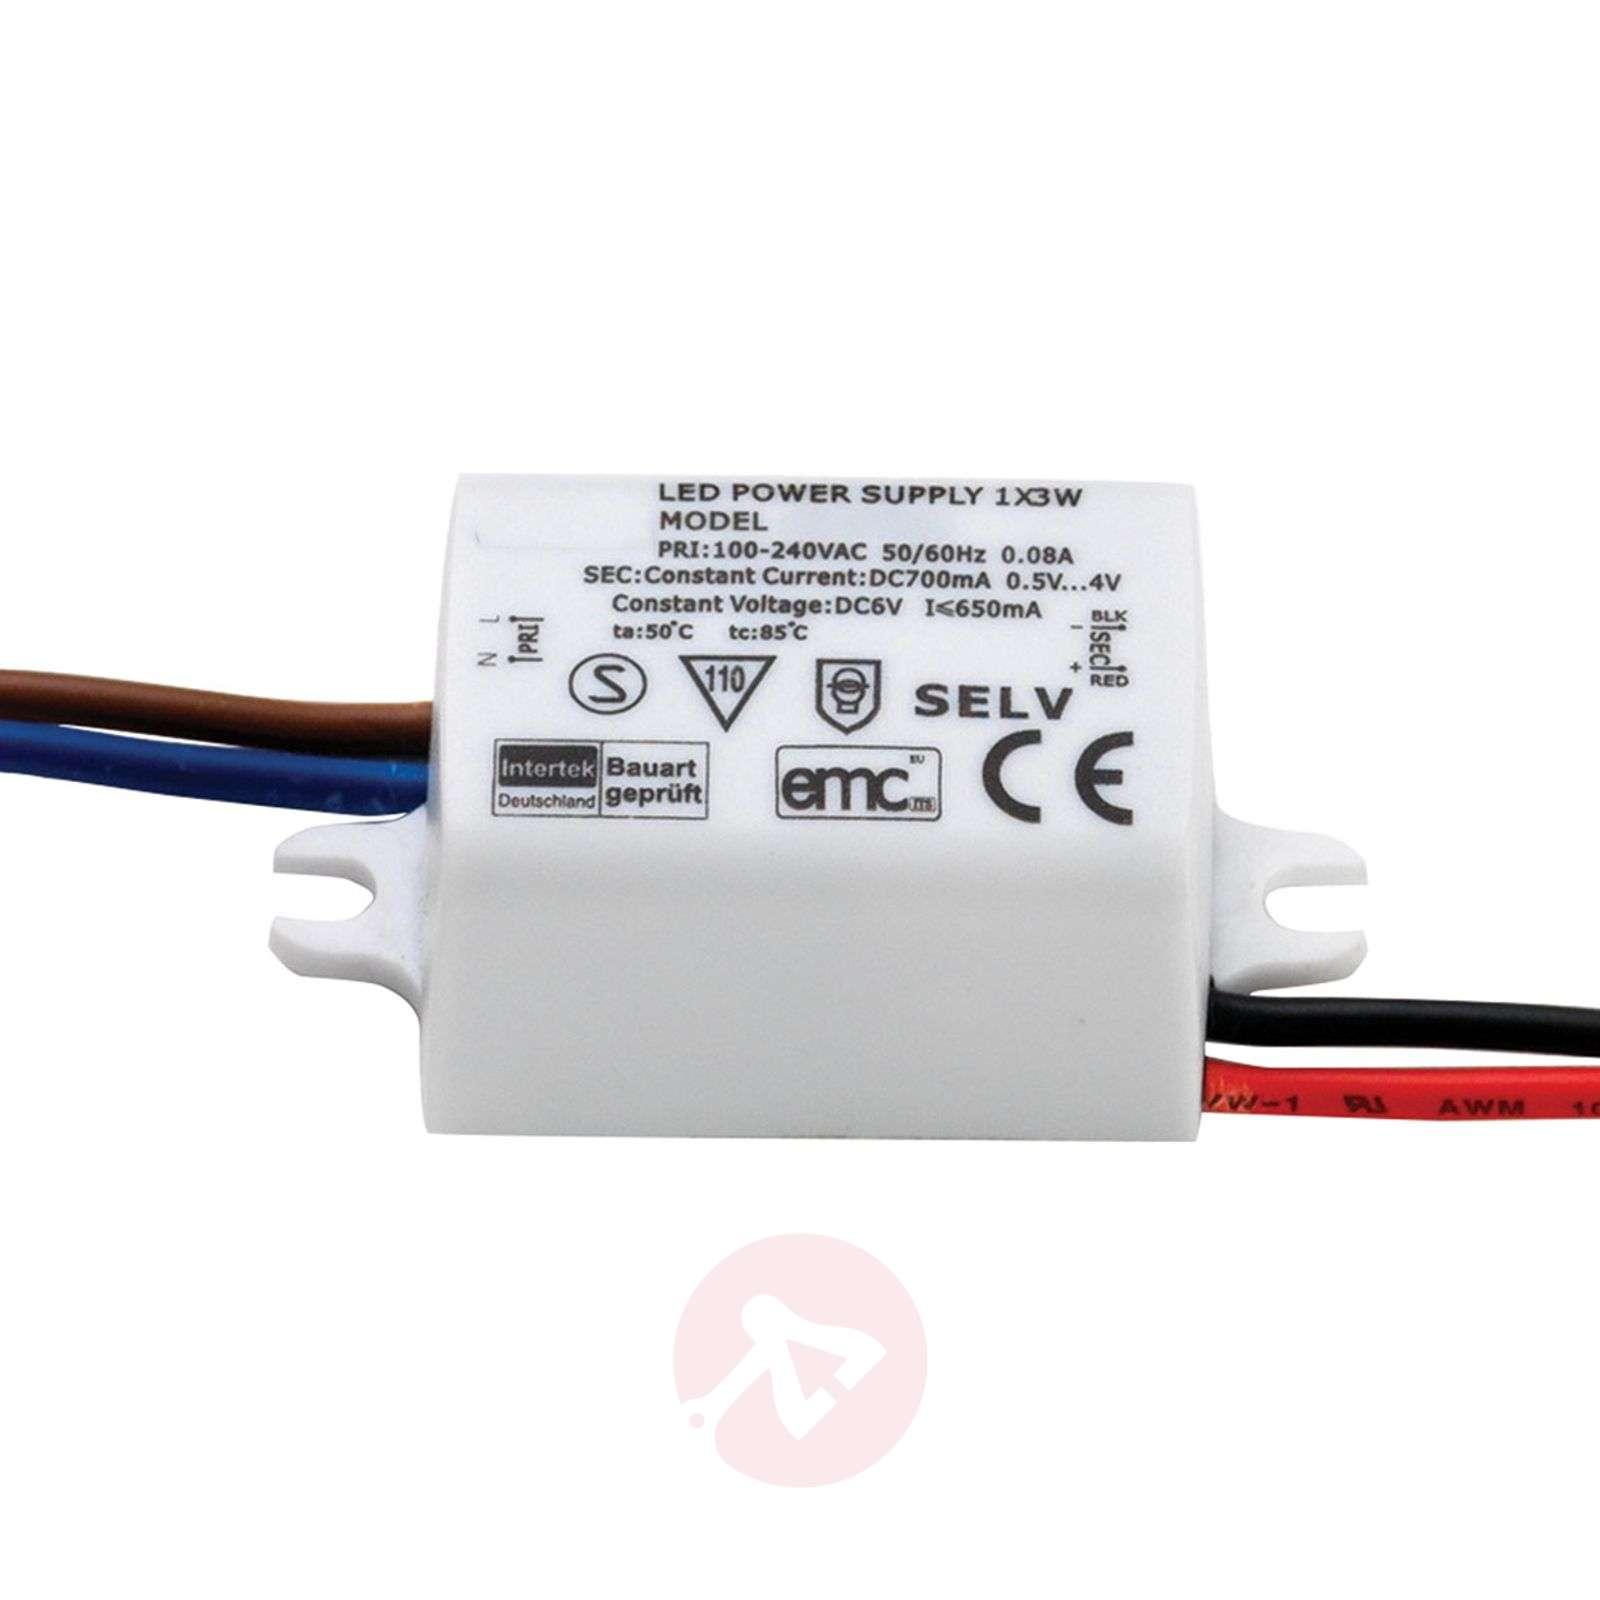 Astro LED-muuntaja 3 W 700 mA-1020598-01